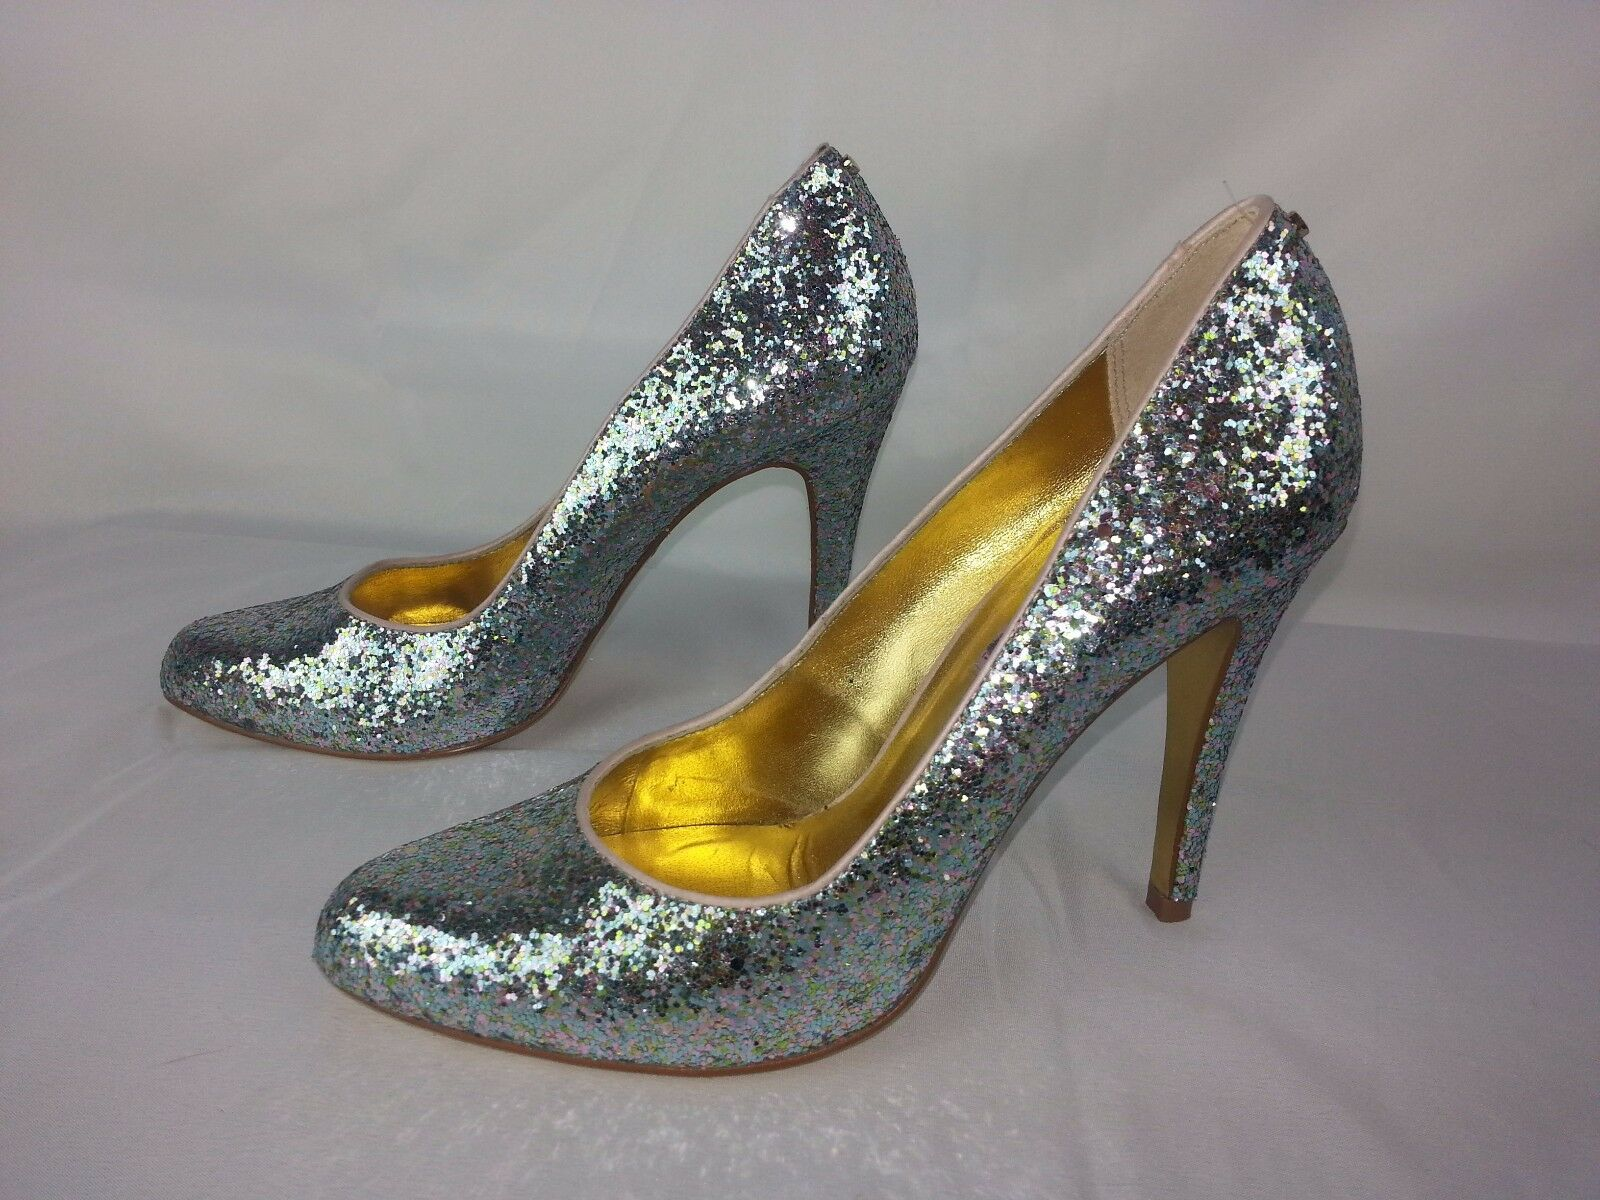 NWOB TED BAKER LONDON CINDERS Silver glitter court HEELS U.S. 8